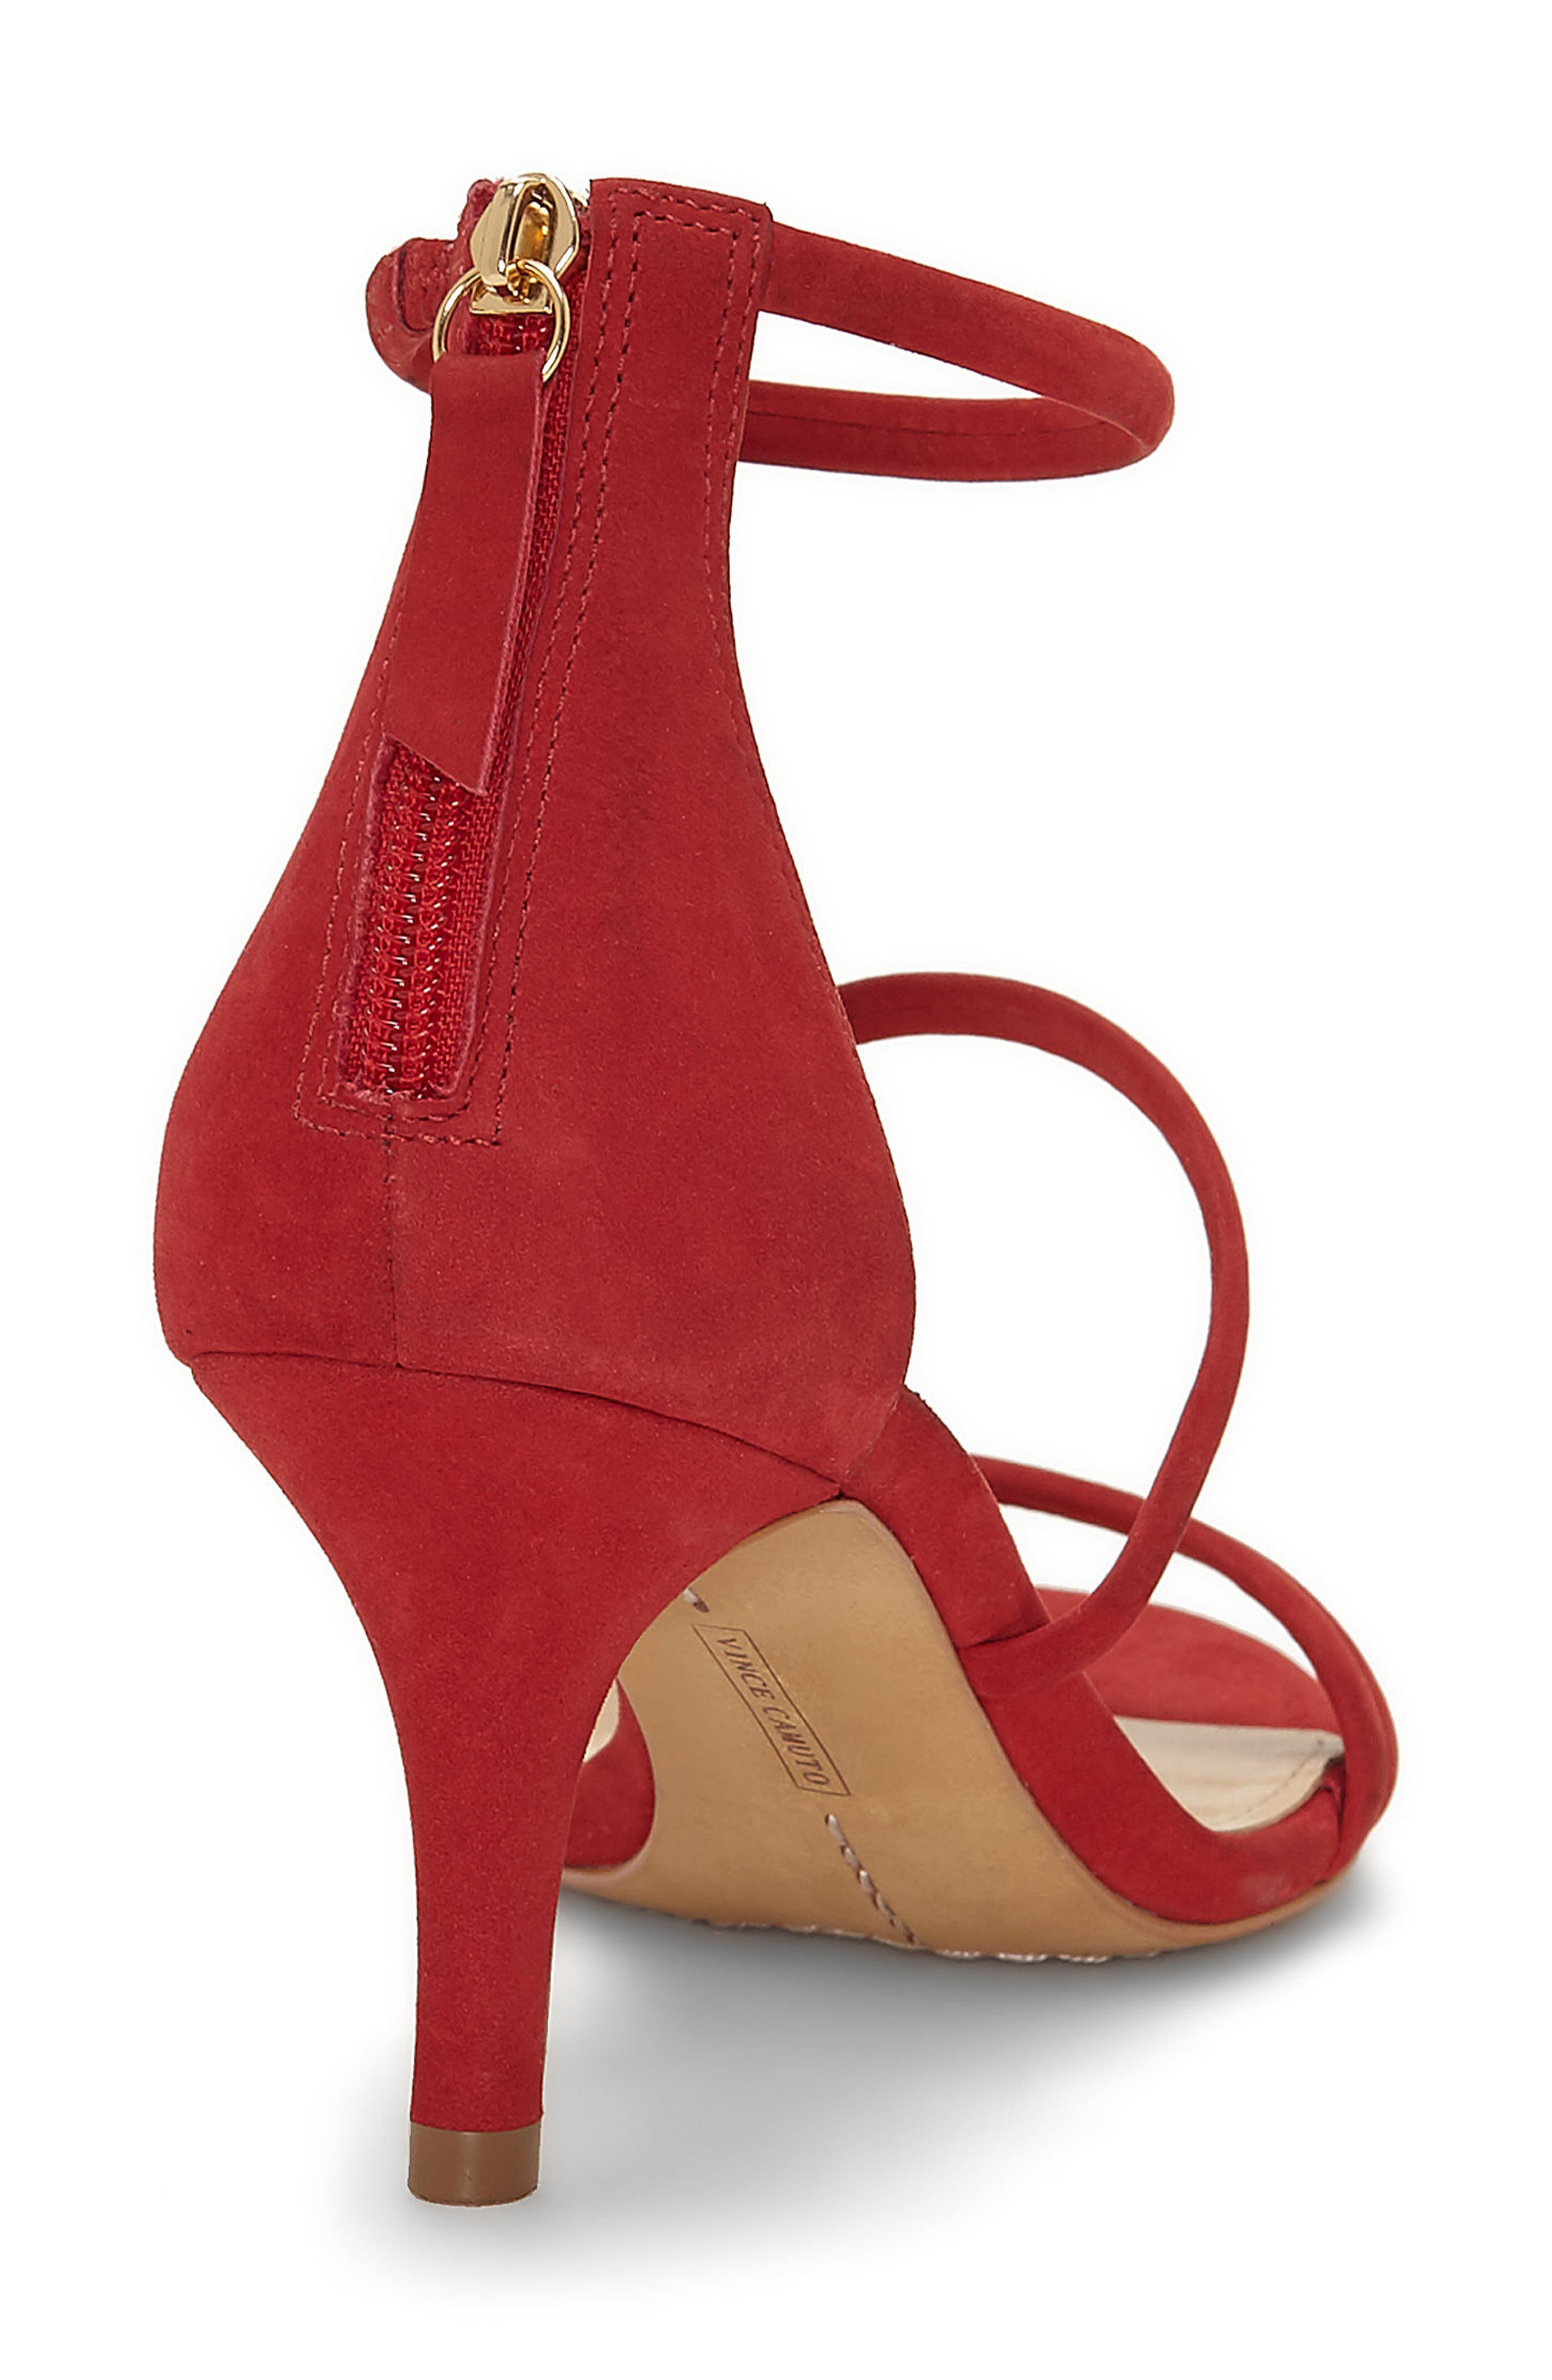 Aviran Sandal,                             Alternate thumbnail 2, color,                             Ruby Red Nubuck Leather